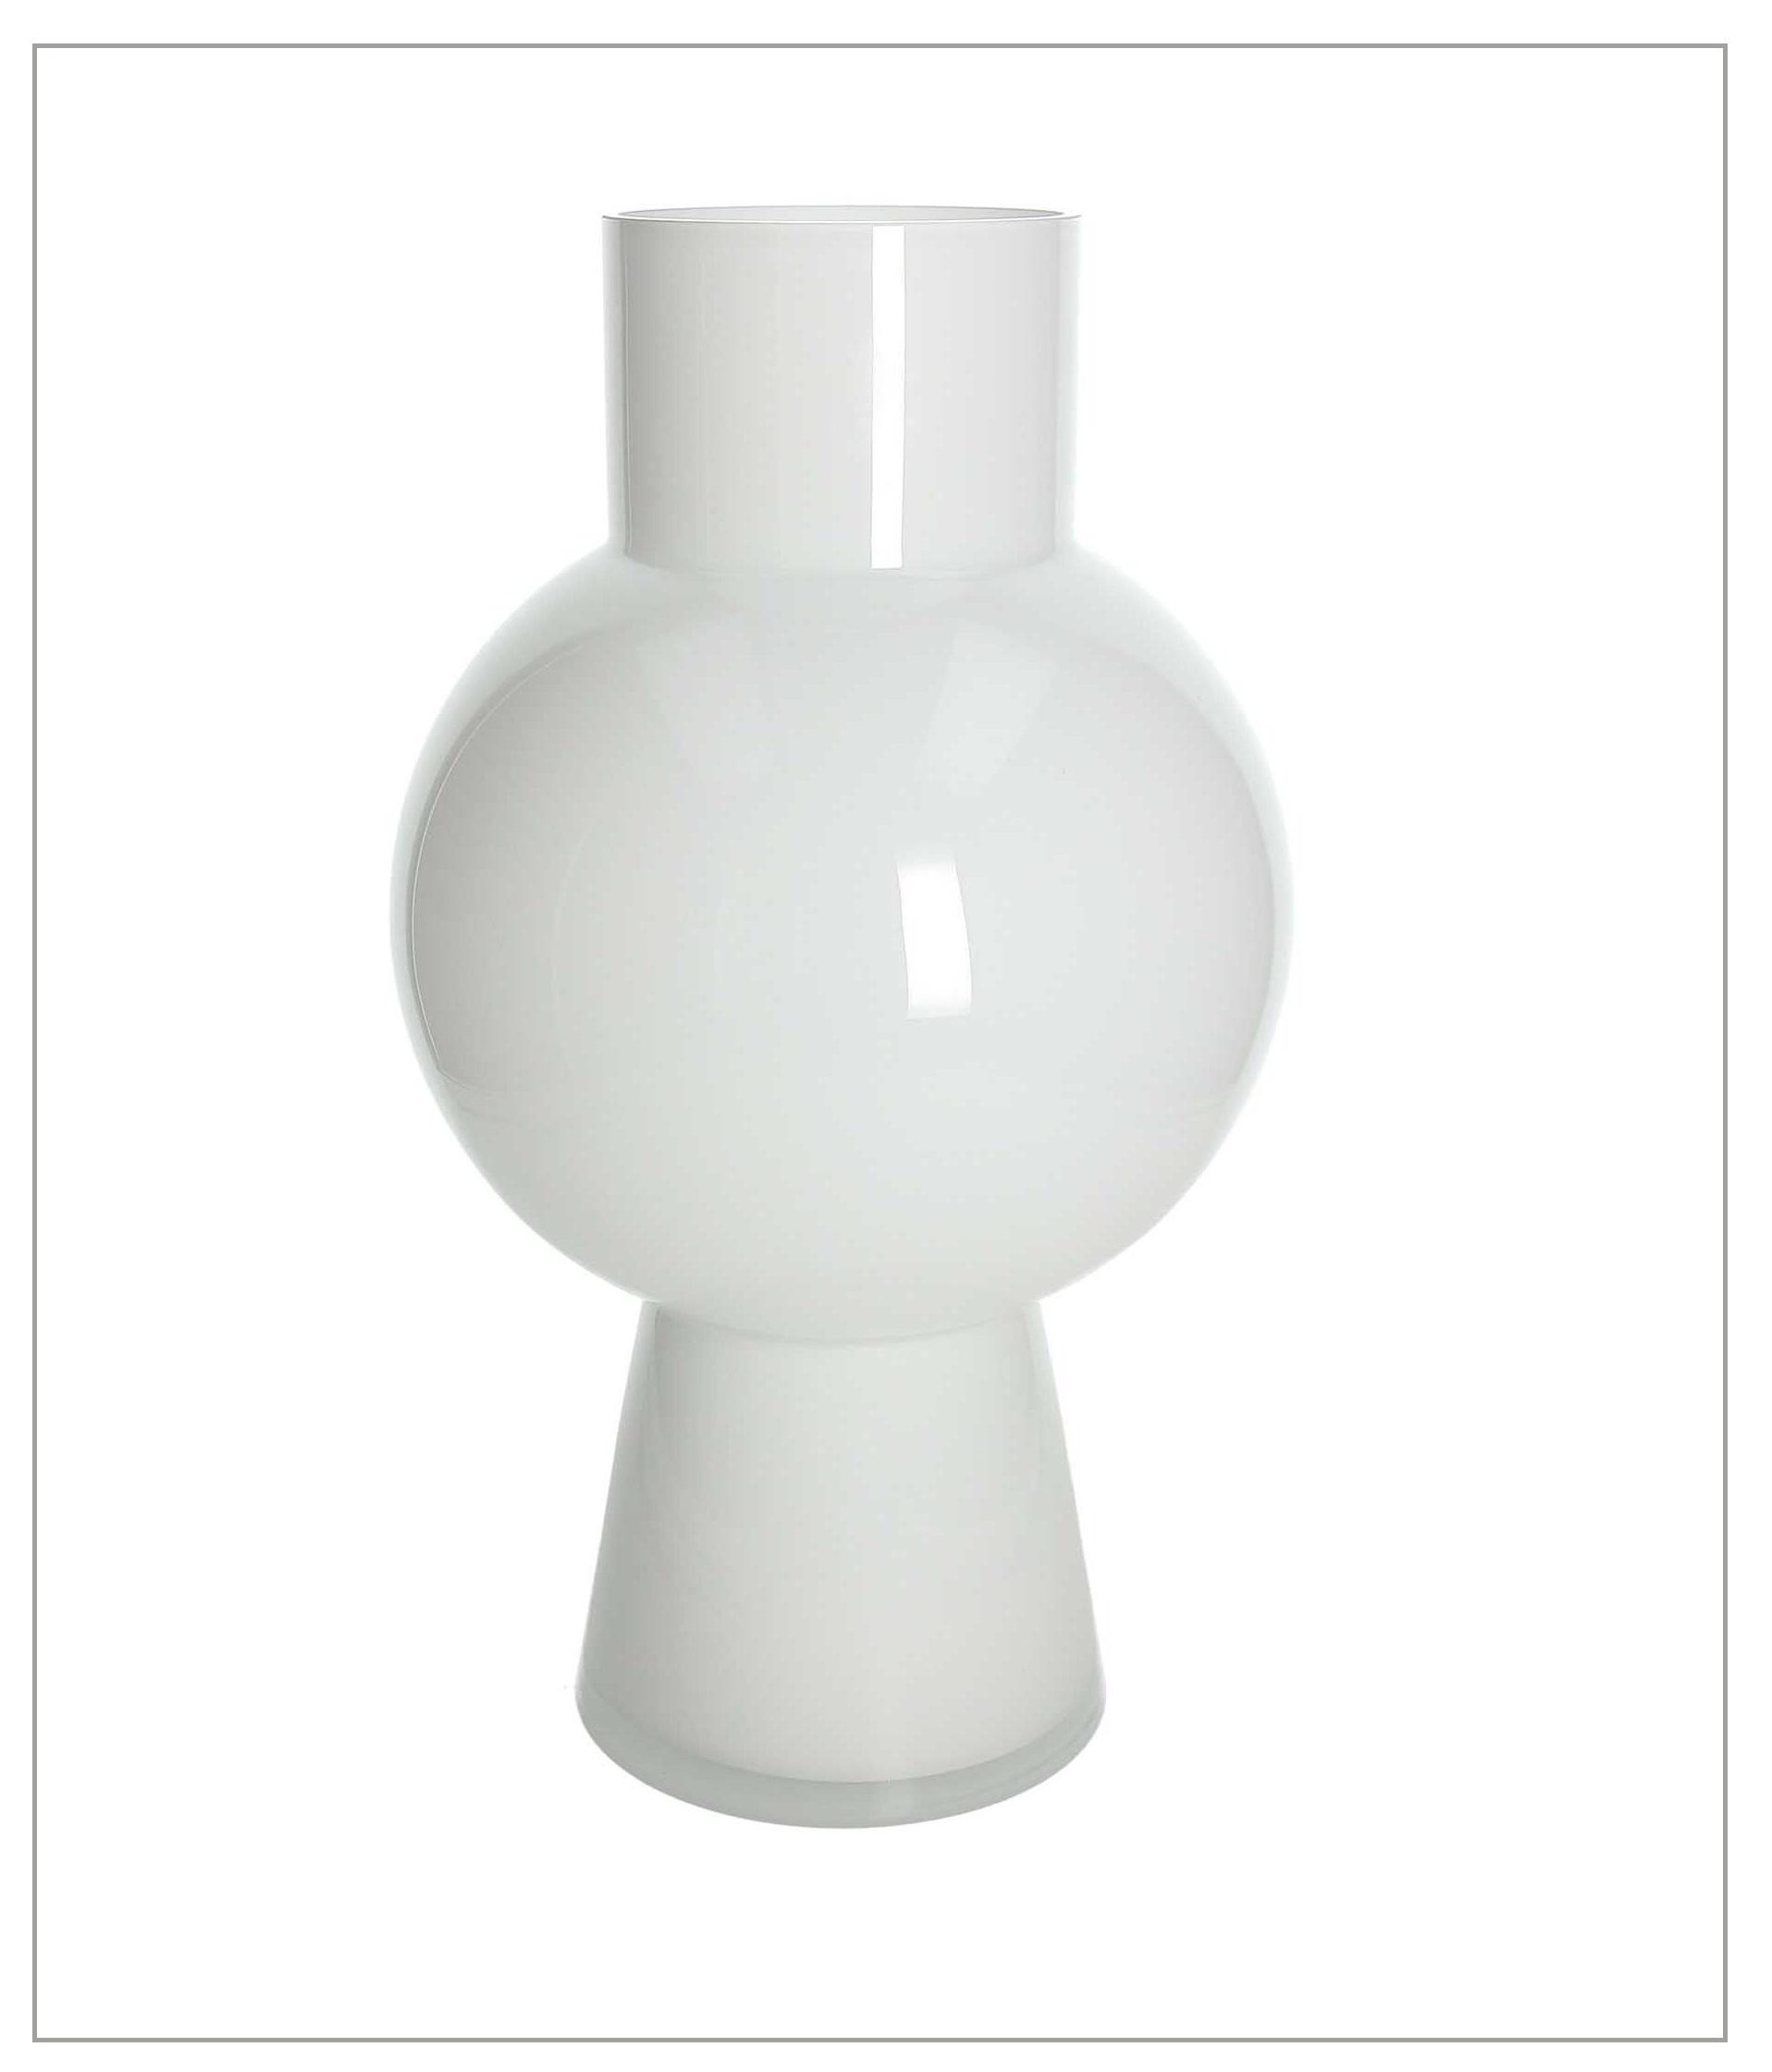 TOGNANA - Vaso Bianco Cm 35h, Kali